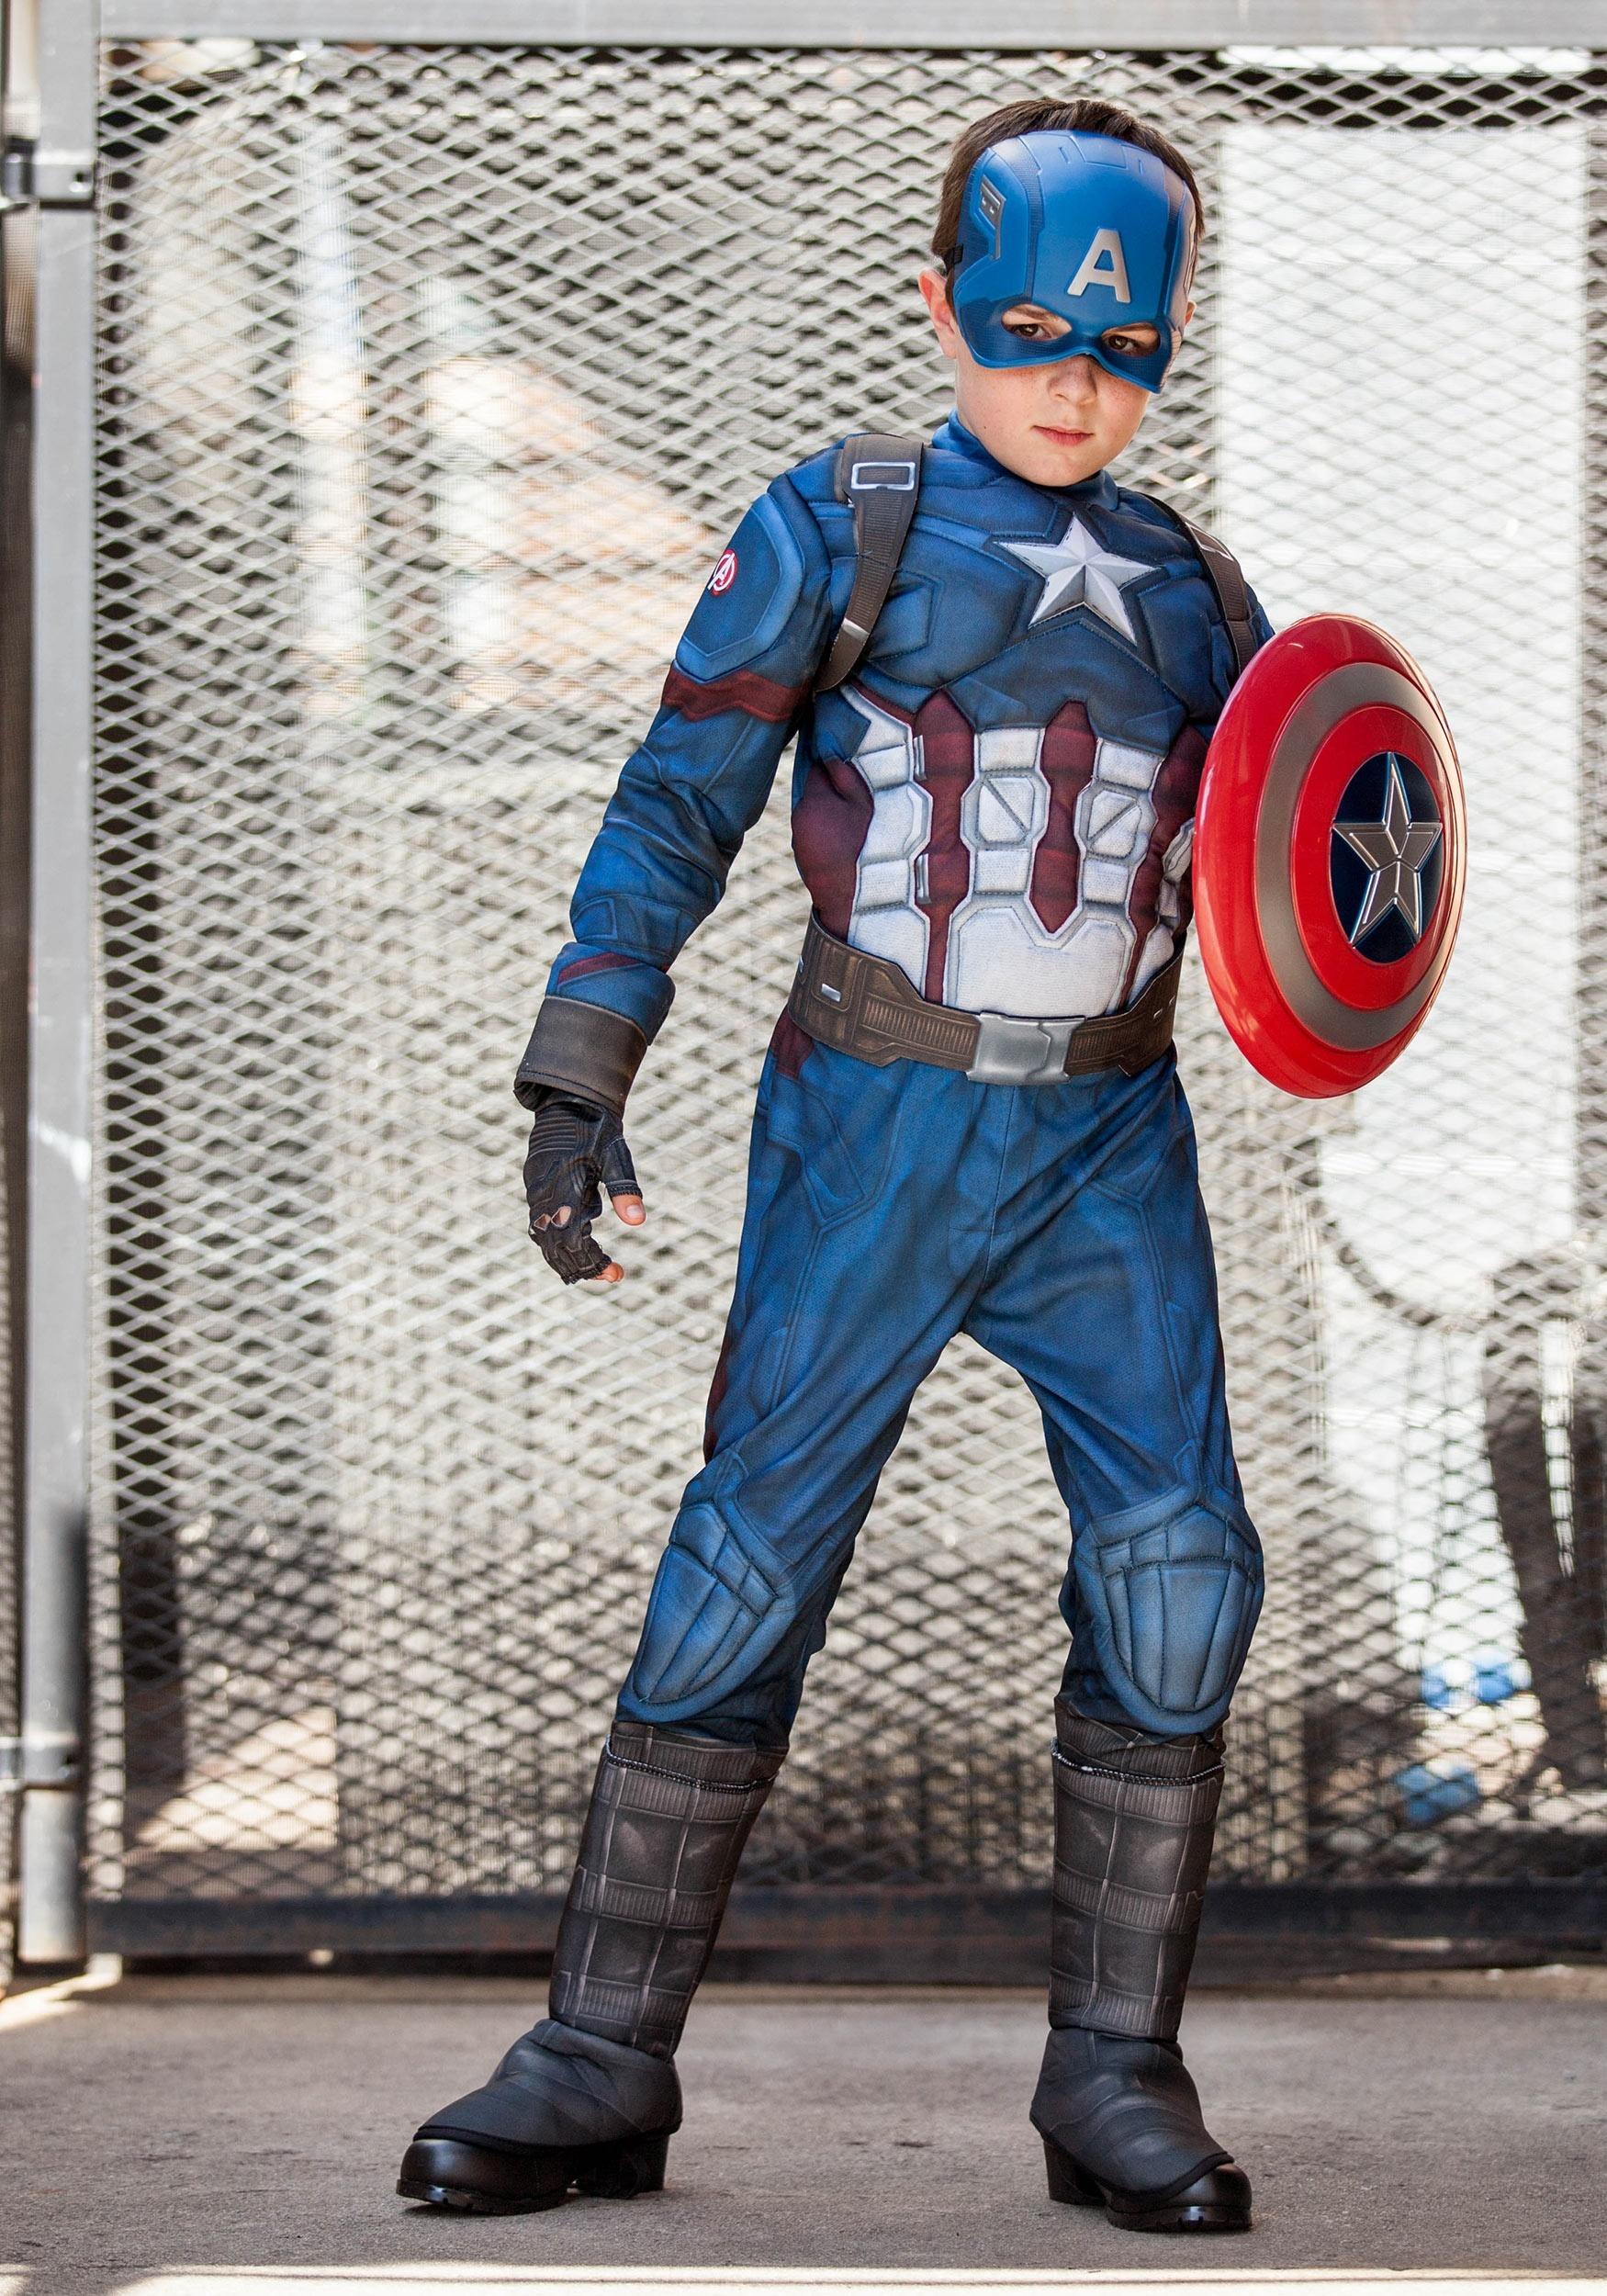 ... Boys Captain America Civil War Deluxe Costume & Captain America Deluxe Costume for Kids